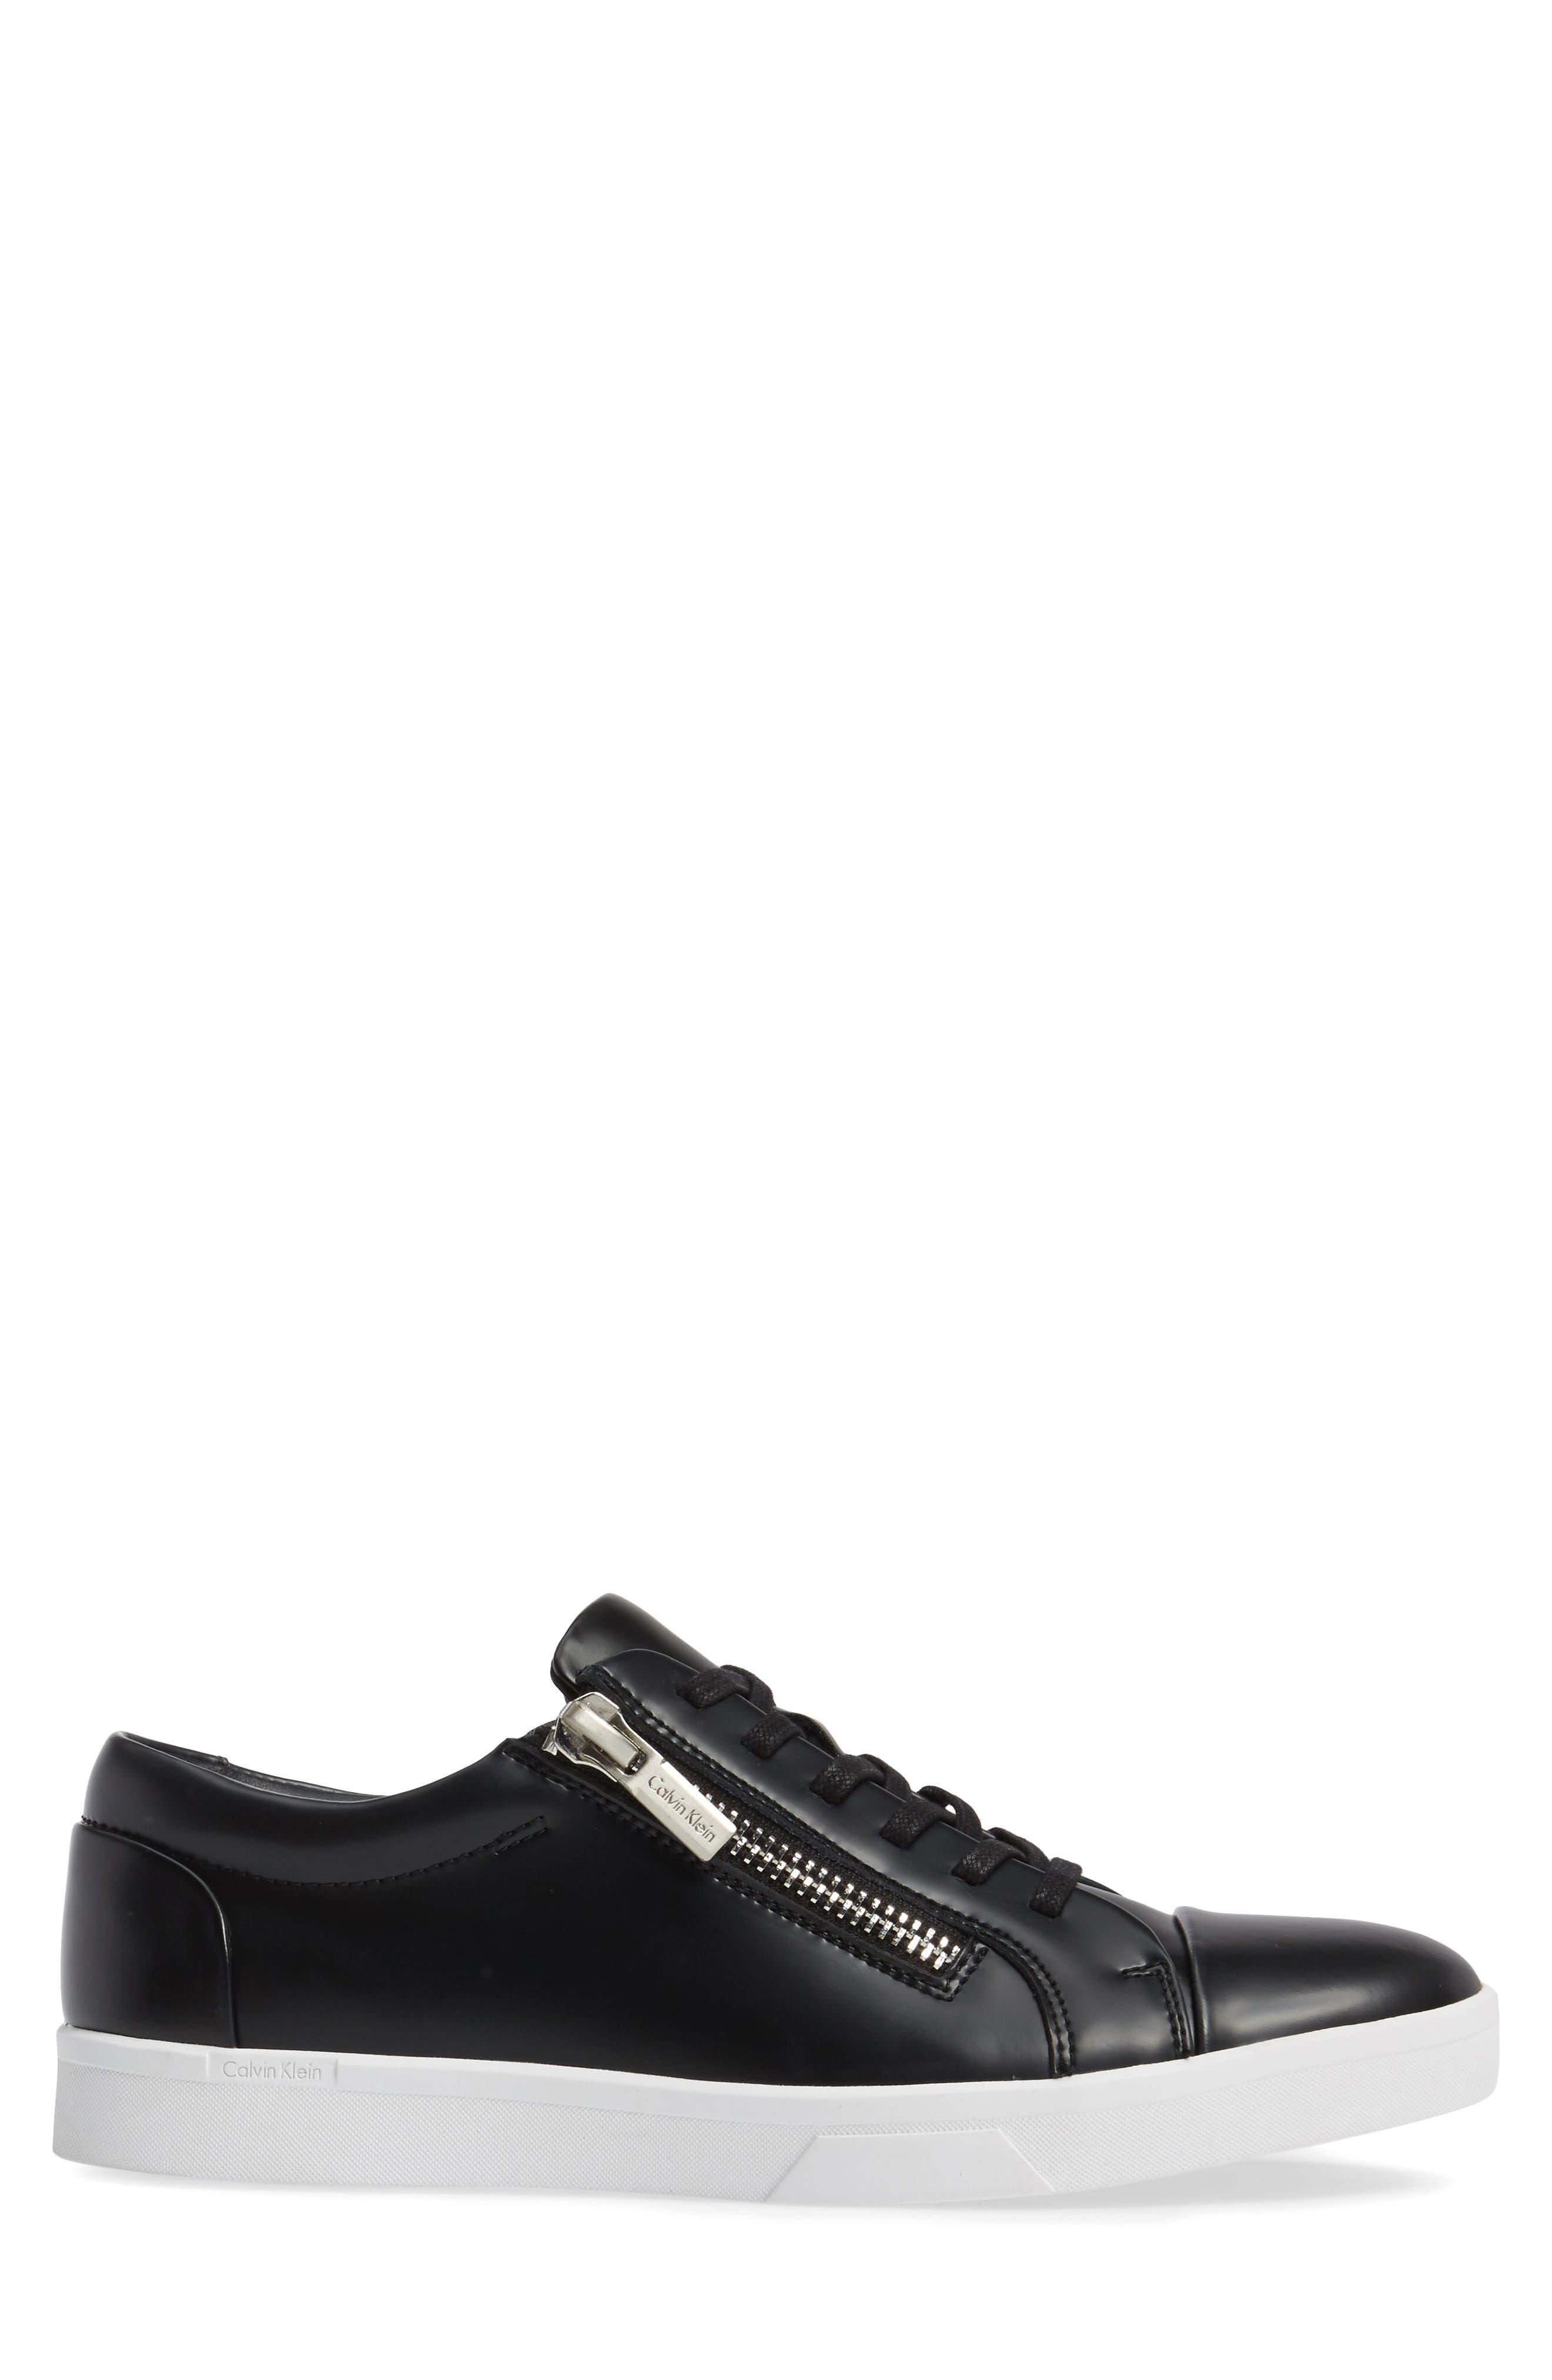 Alternate Image 3  - Calvin Klein Ibrahim Cap-Toe Zip Sneaker (Men)